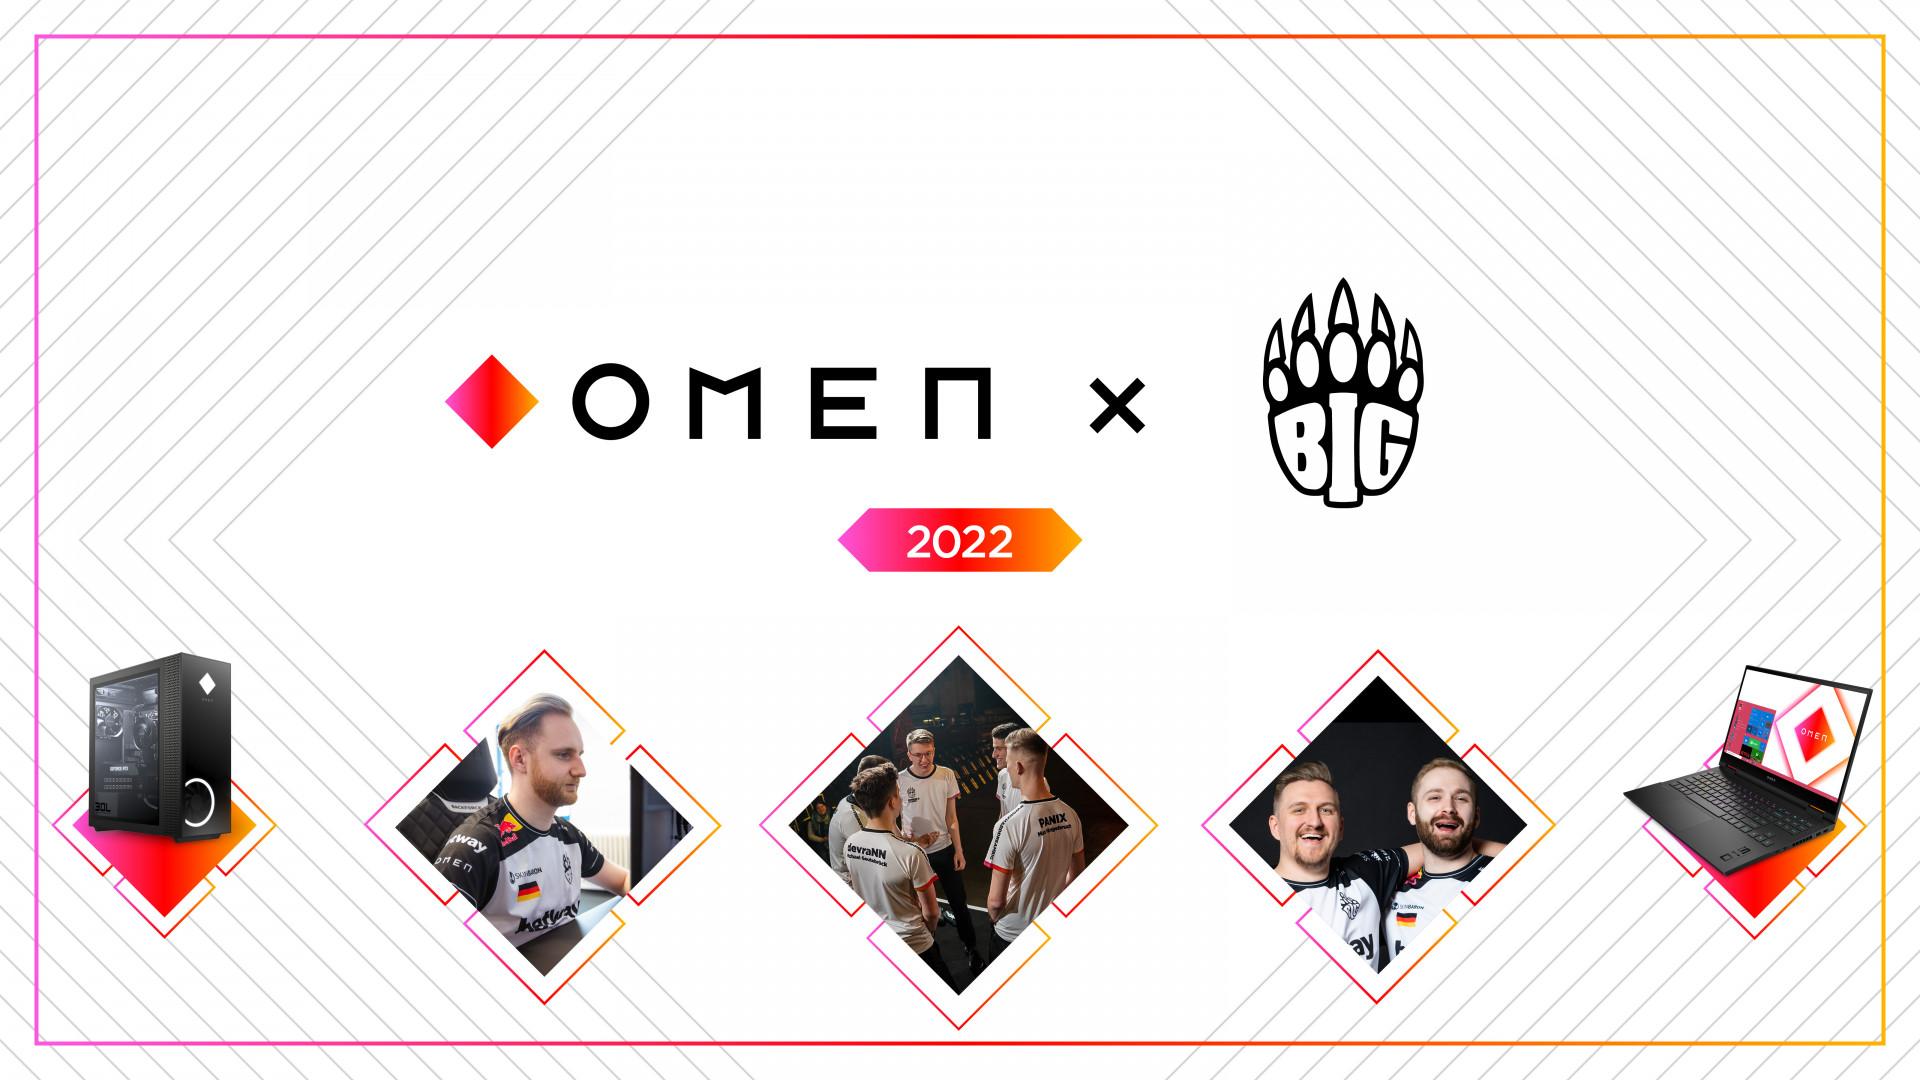 BIG expands partnership with OMEN thumbnail